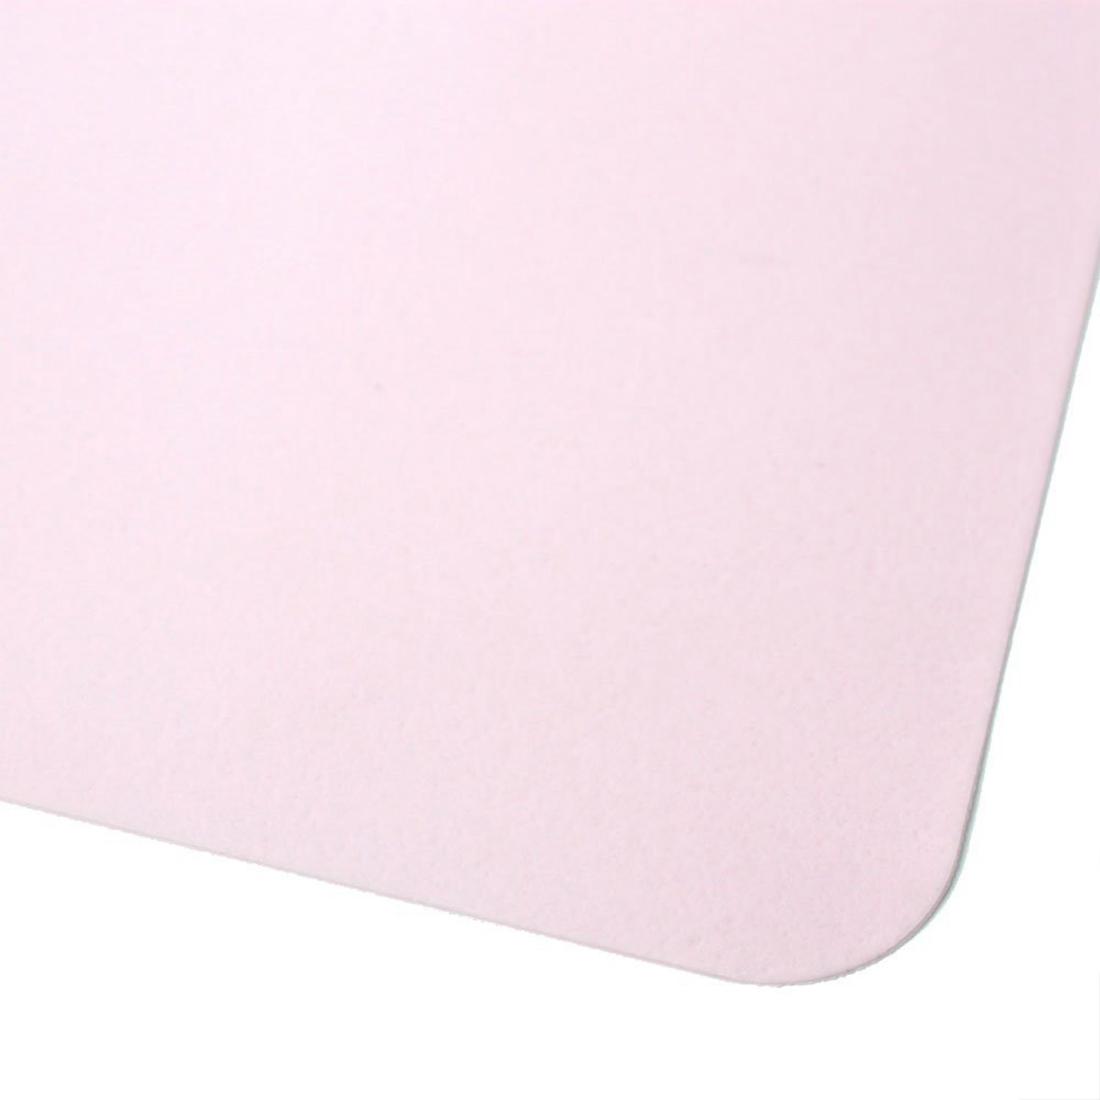 ultraduenne laptop desktop silica gel maus pad mice mat. Black Bedroom Furniture Sets. Home Design Ideas